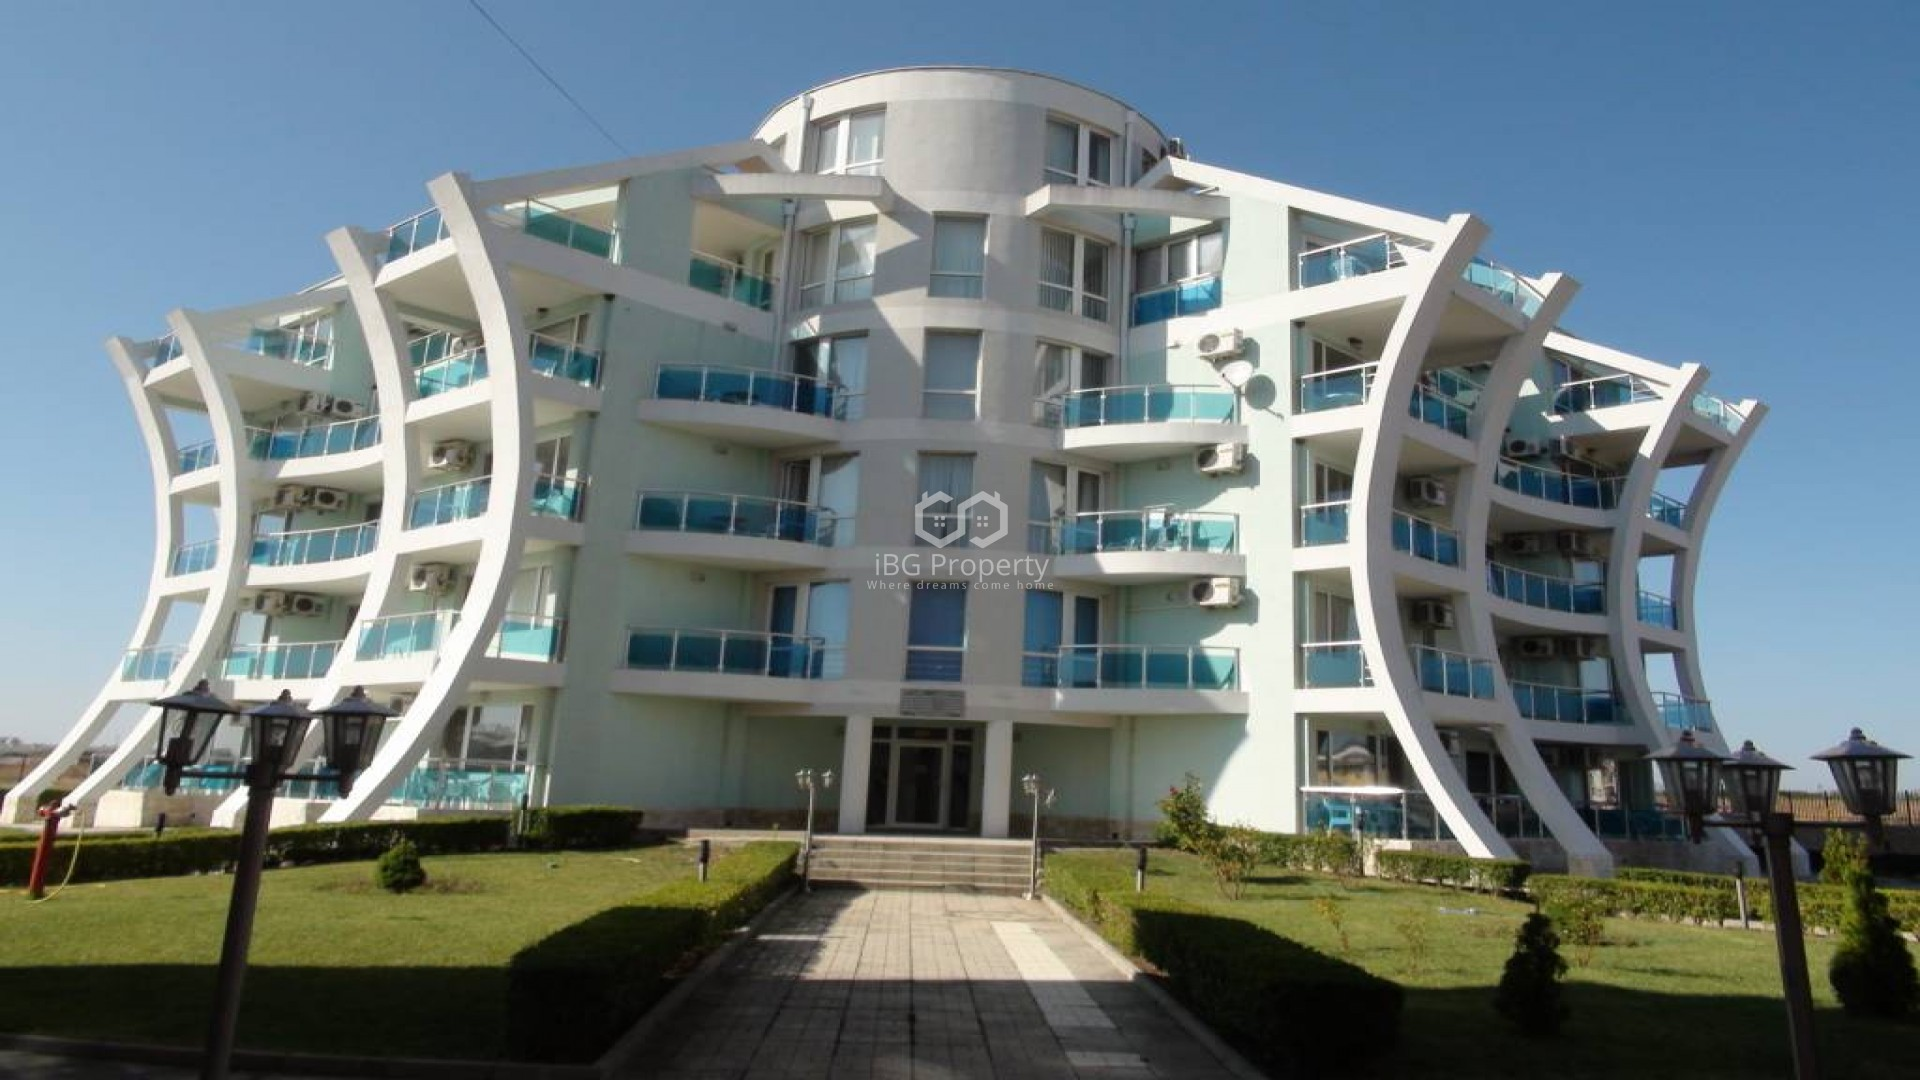 Однокомнатная квартира Ахелой 49 m2